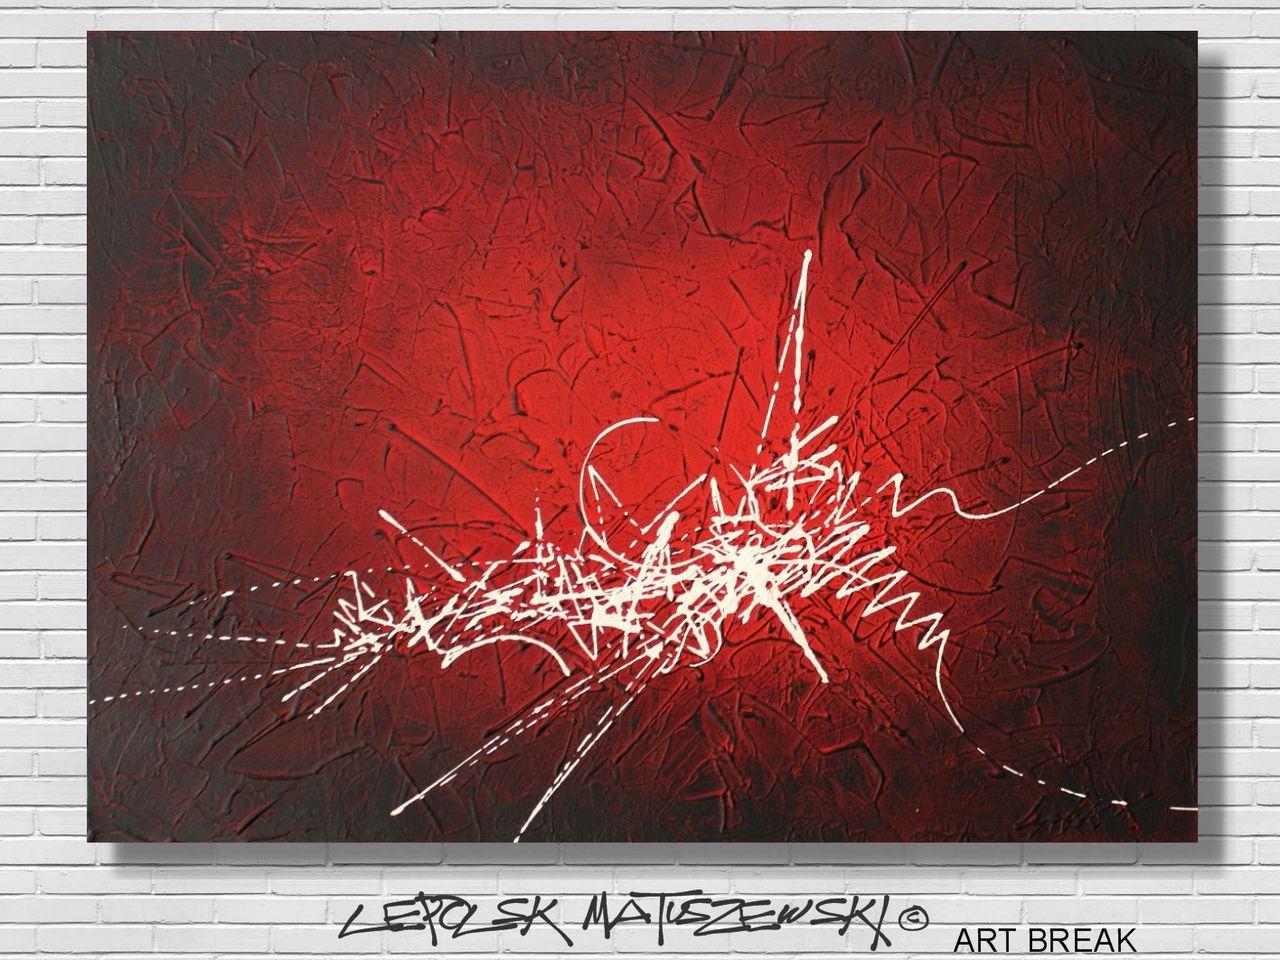 MISTER K  (Lepolsk Matuszewski) ART BREAK   ( expressionnisme abstrait contemporain )